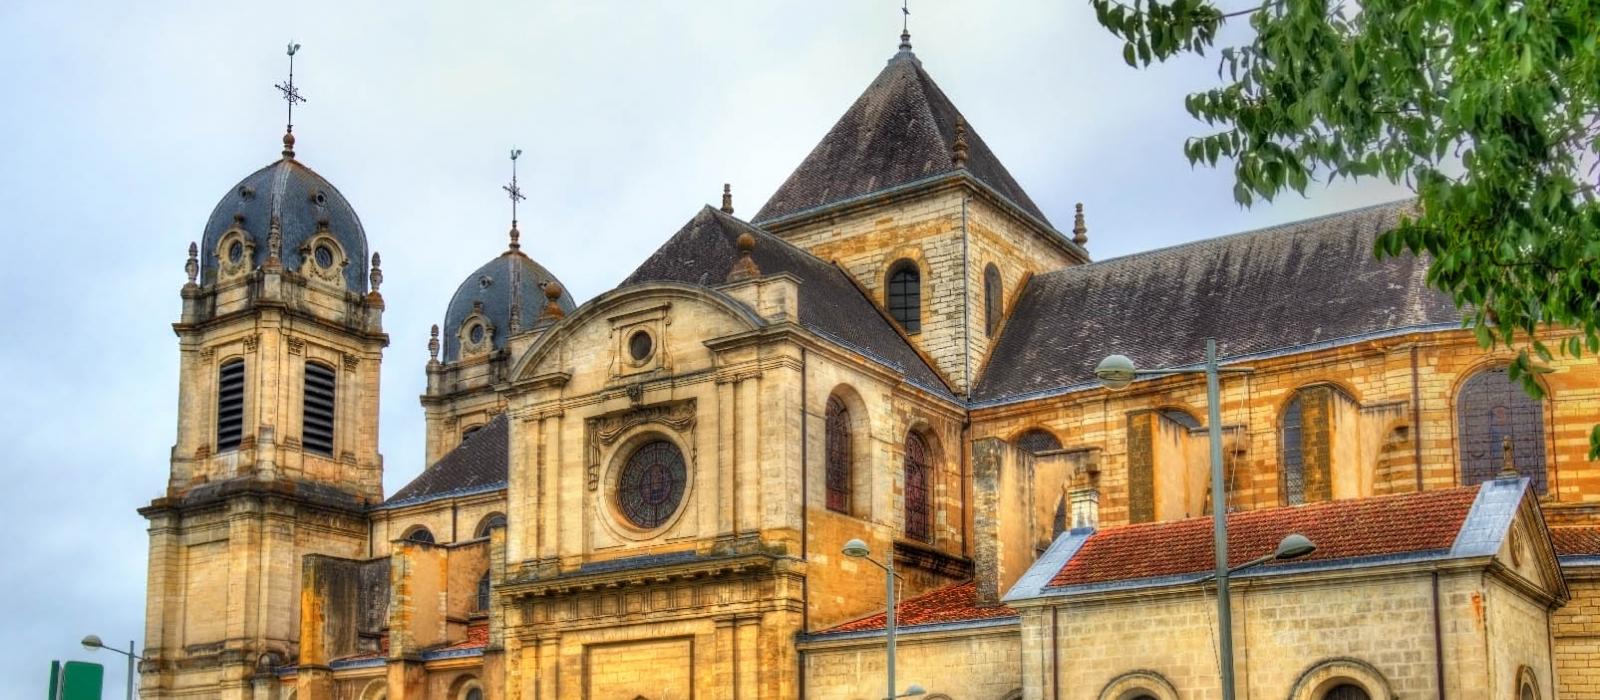 Dax et Saint-Paul-lès-Dax